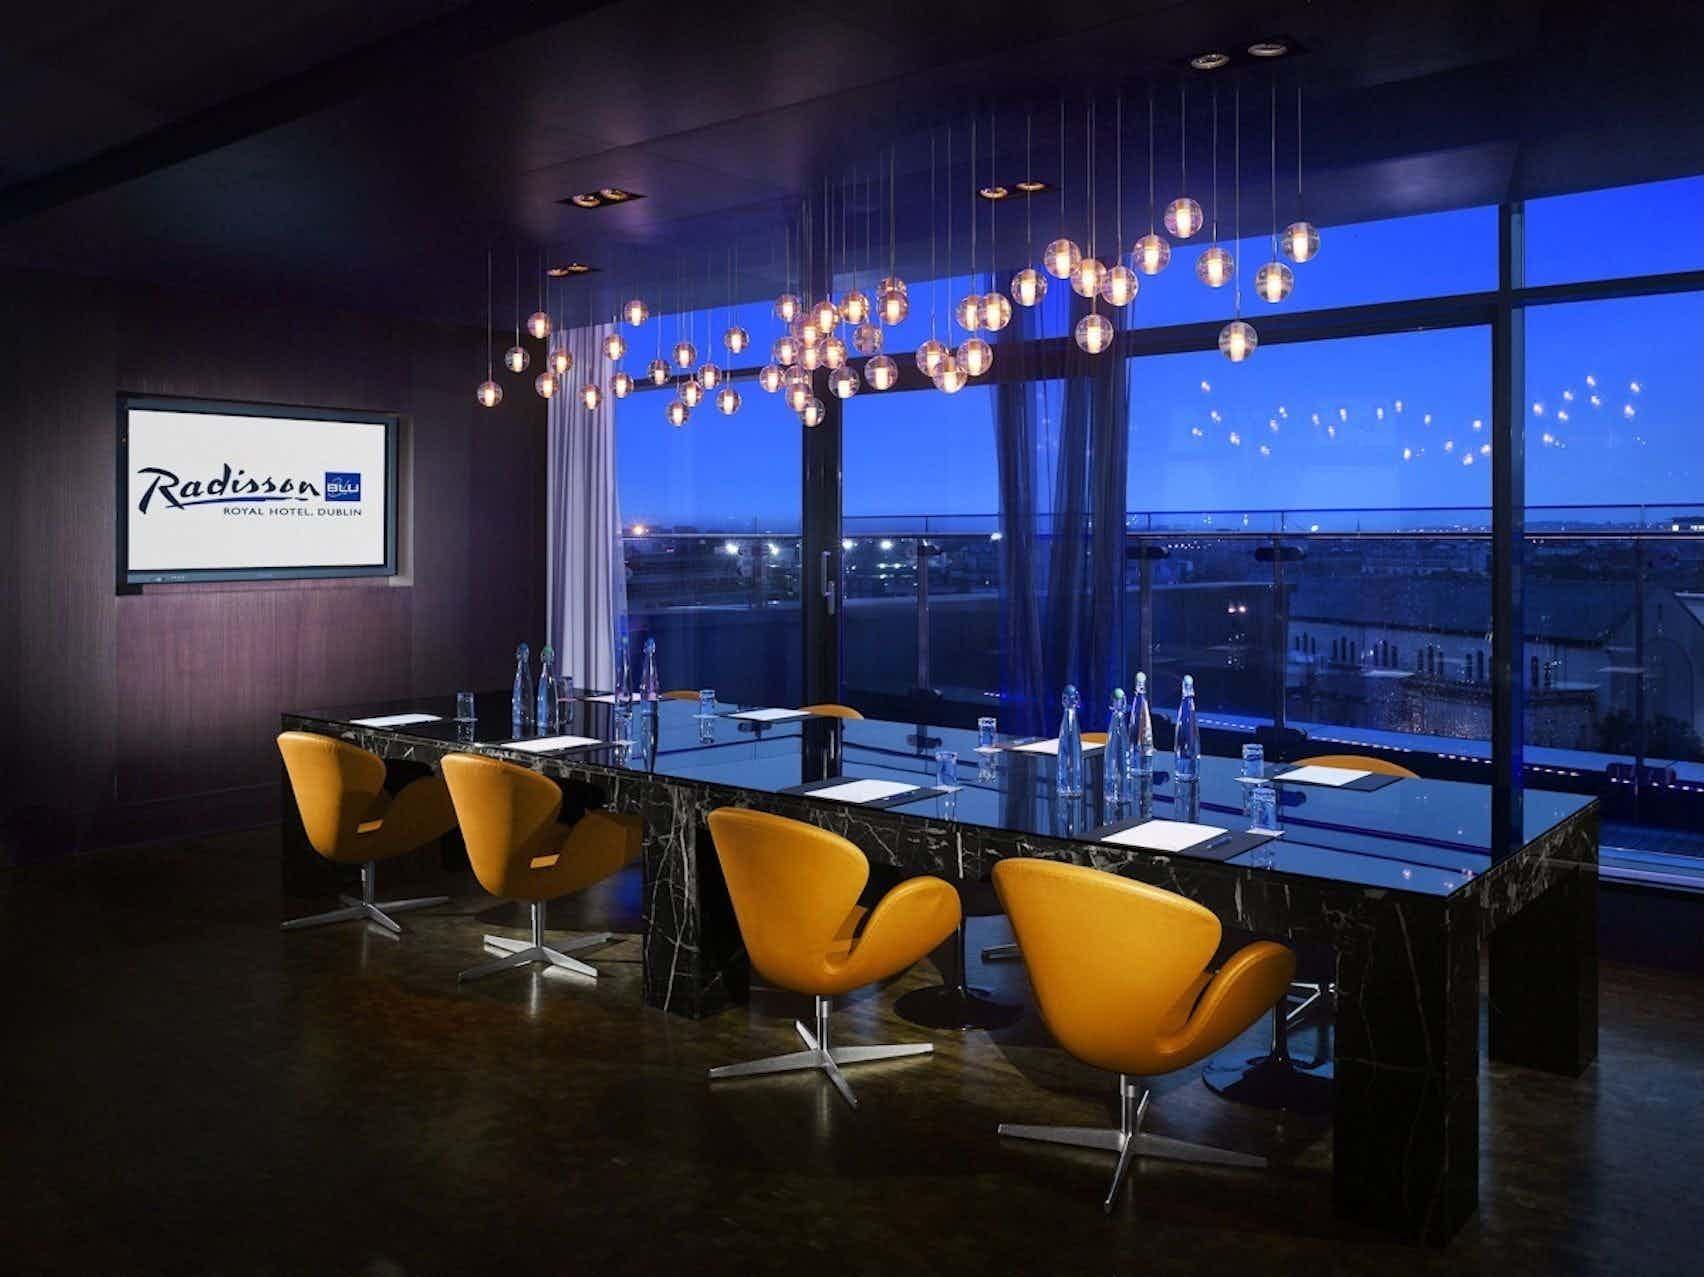 Sky Suite, The Radisson Blu Royal Hotel